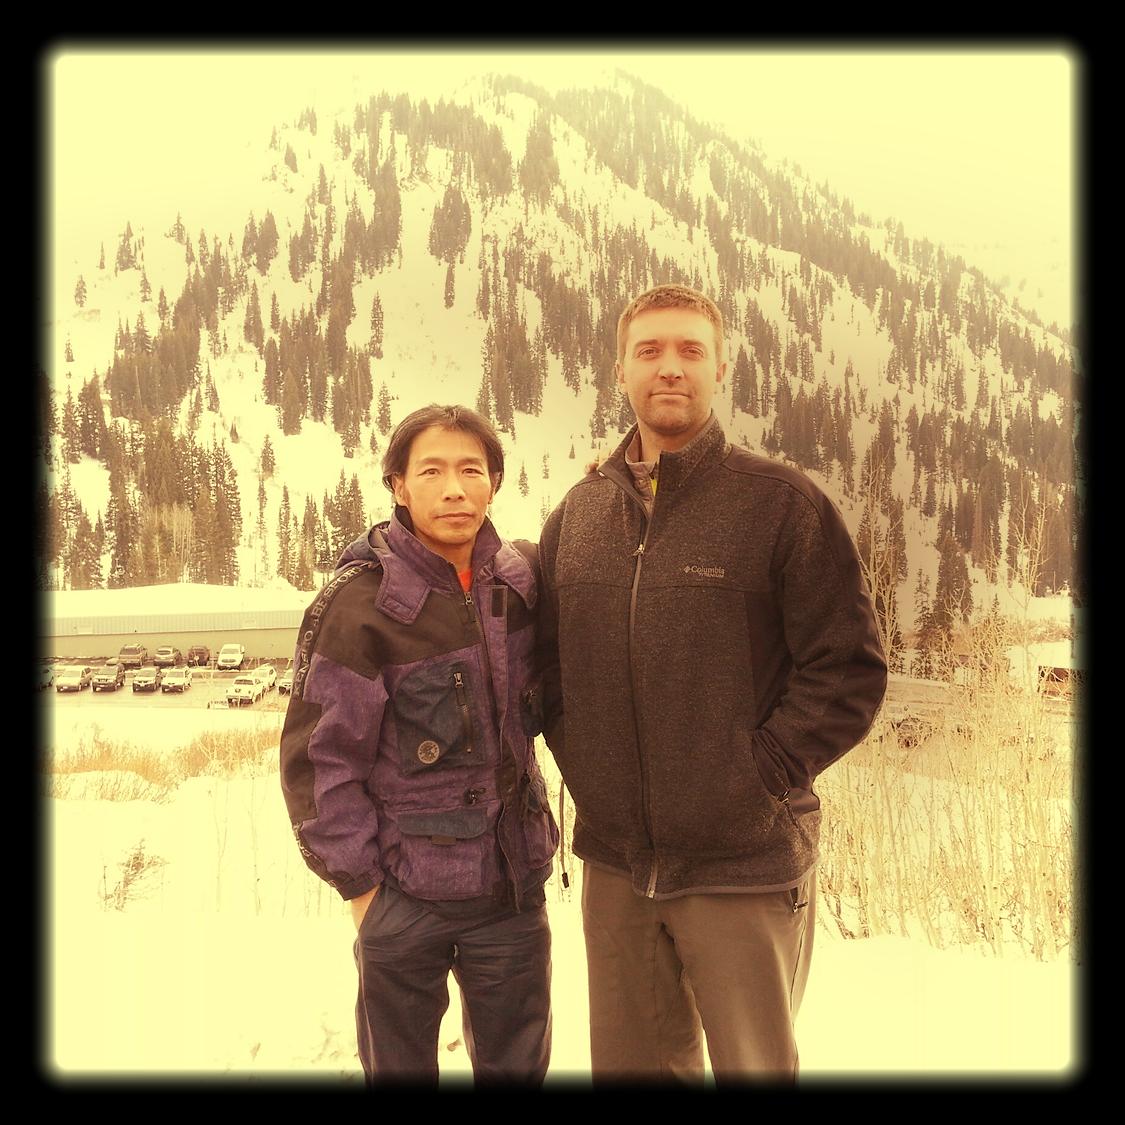 Shifu Woolsey with Master Su Tong Yu, Little Cottonwood Canyon, 2014